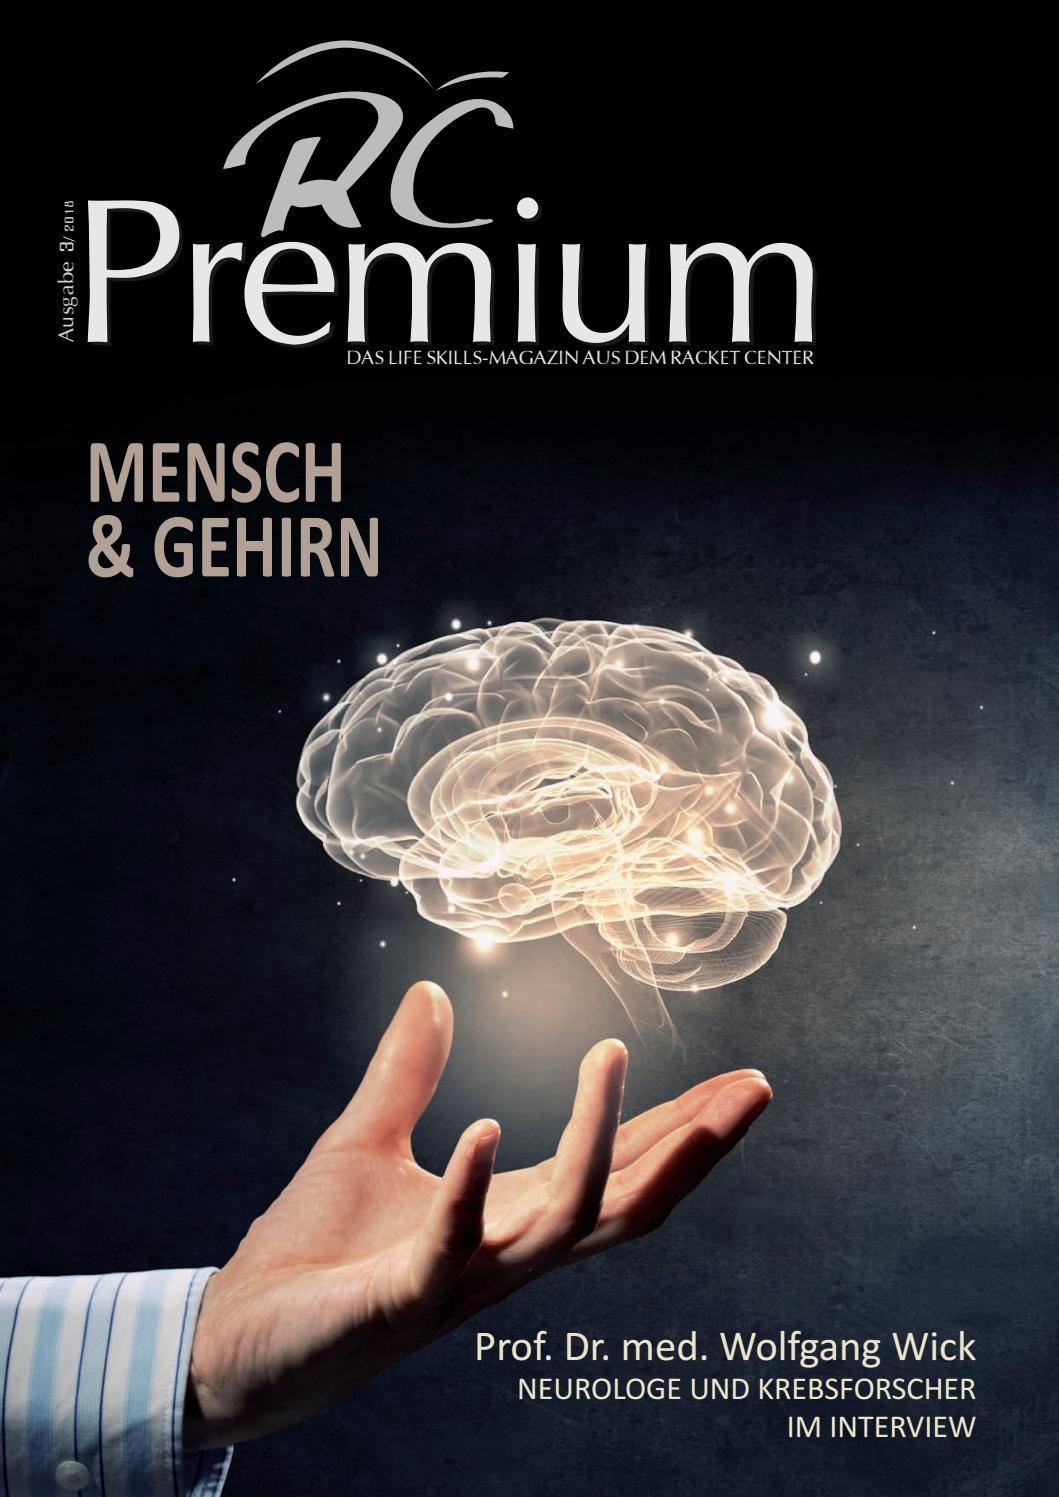 RC Premium 3/2018 by GSM mbH - issuu